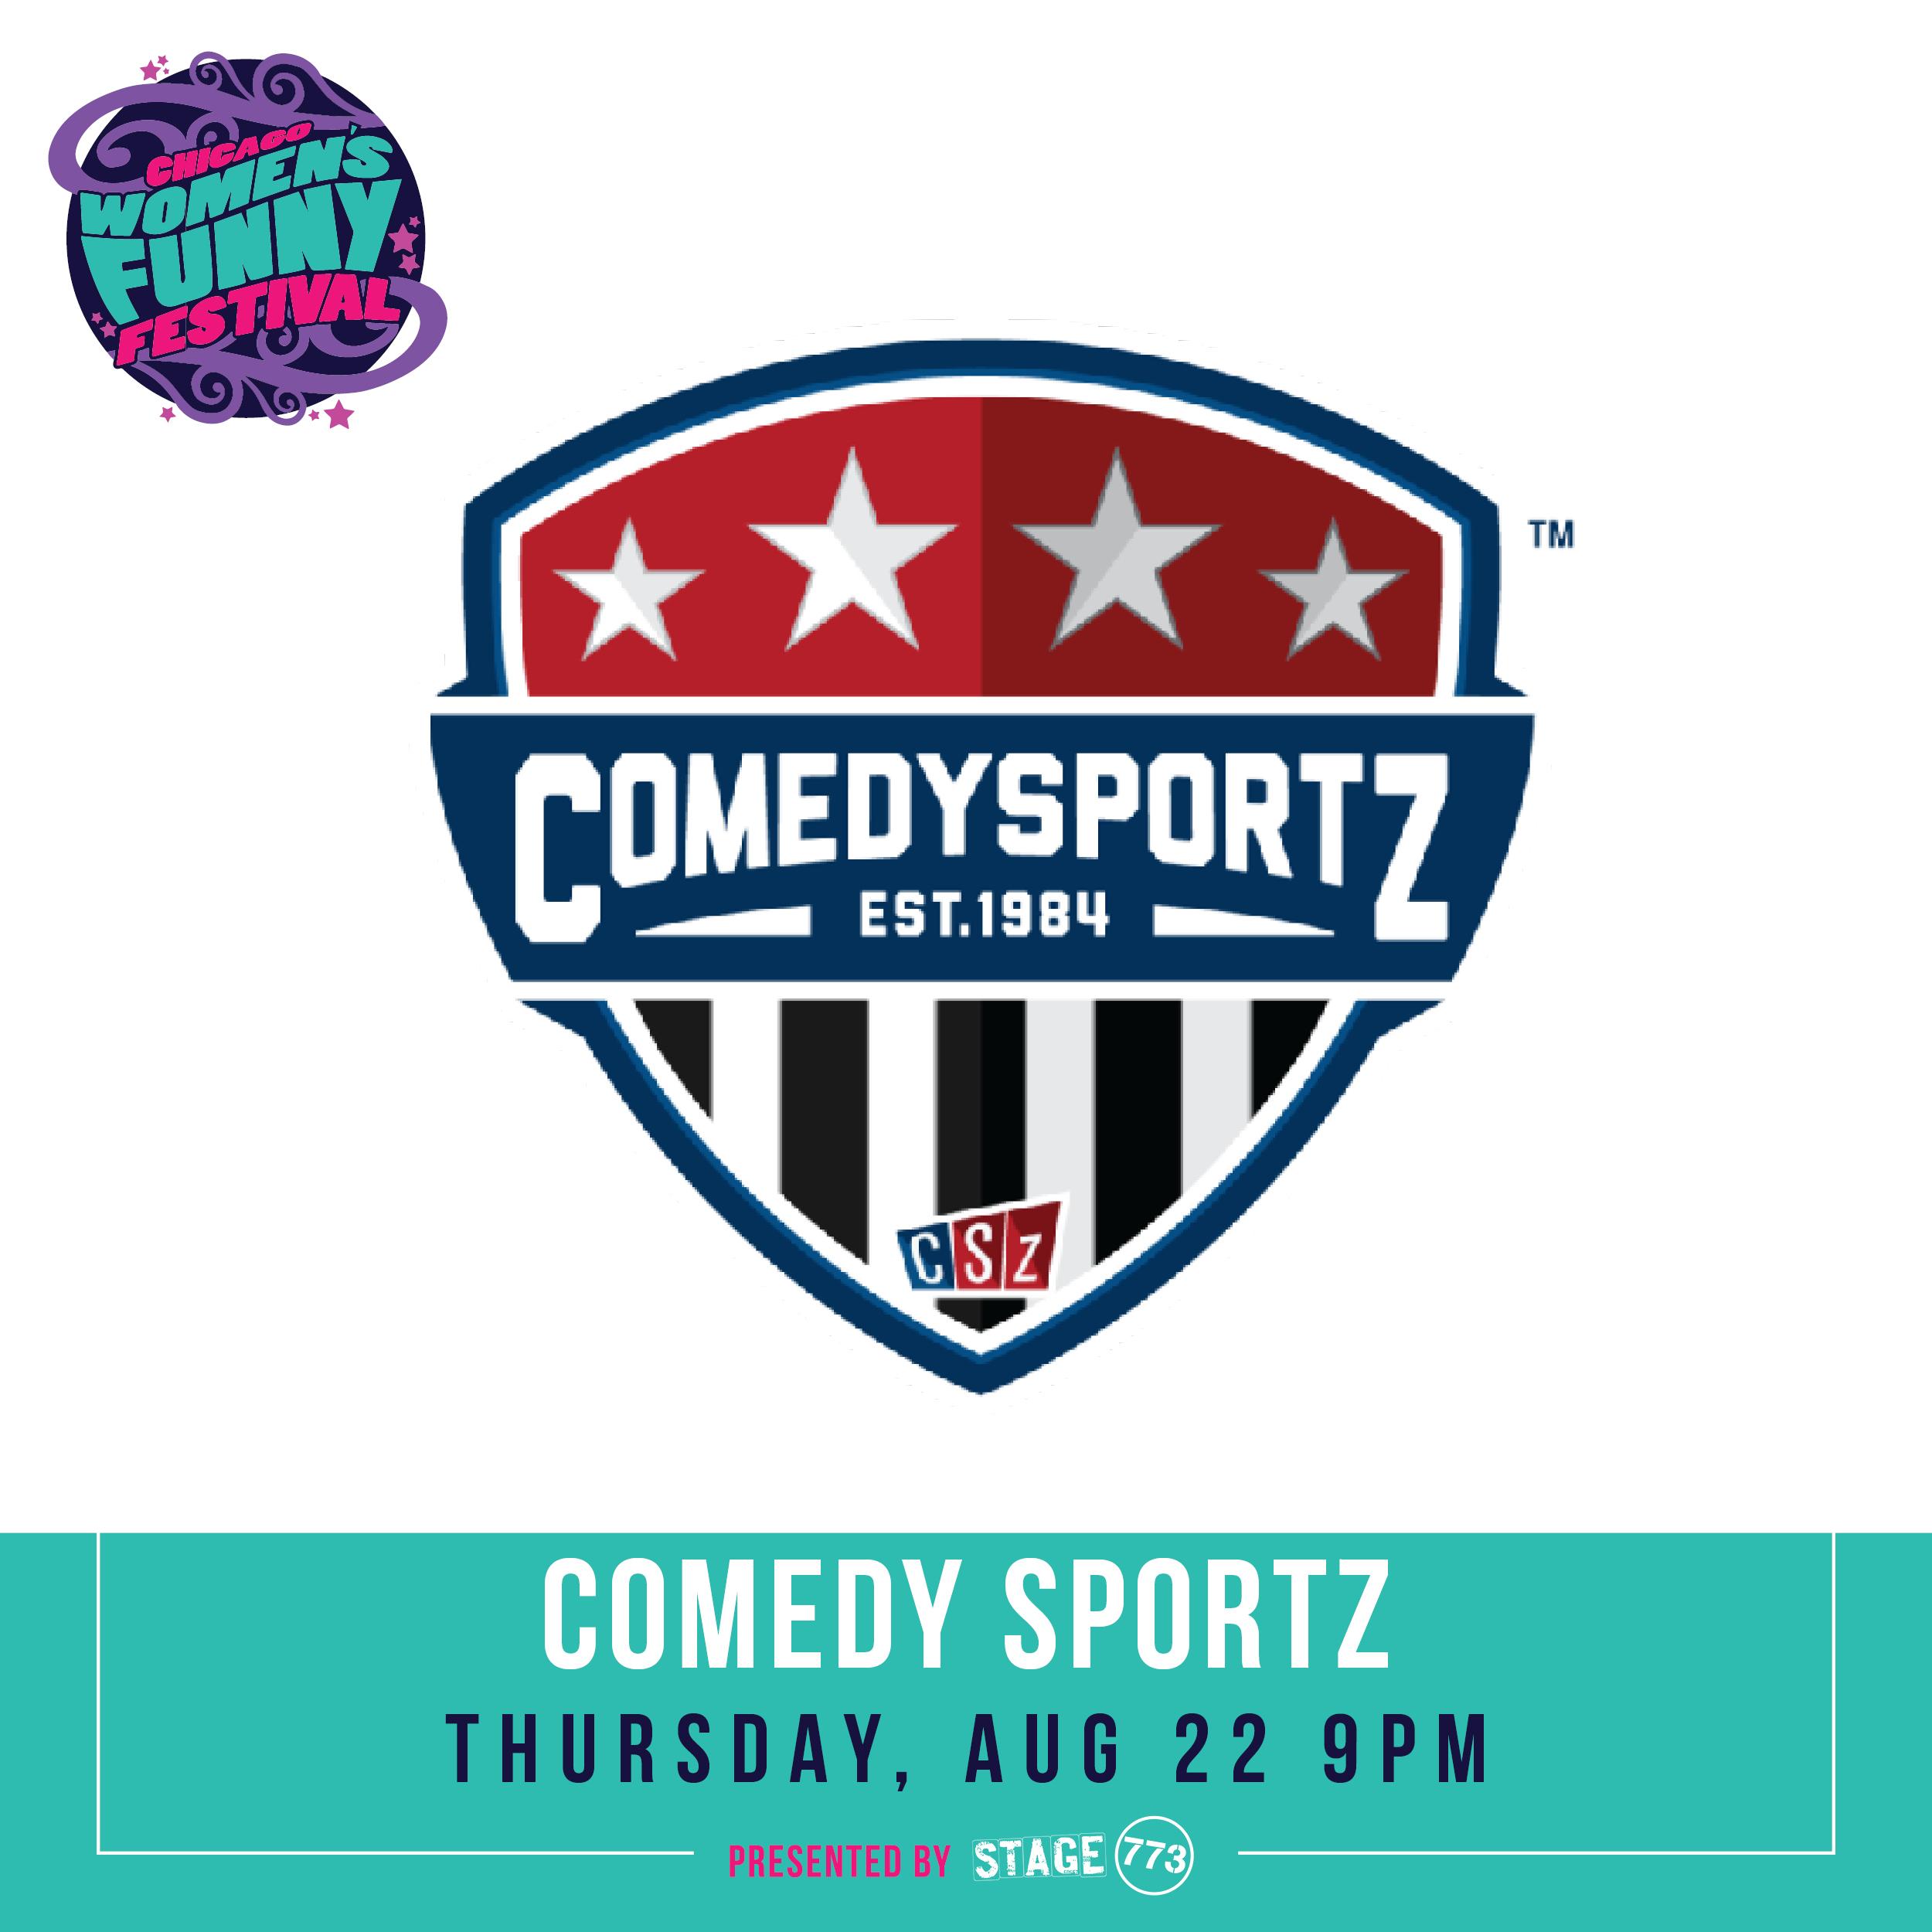 ComedySportz_Thursday_9PM_CWFF20196.jpg